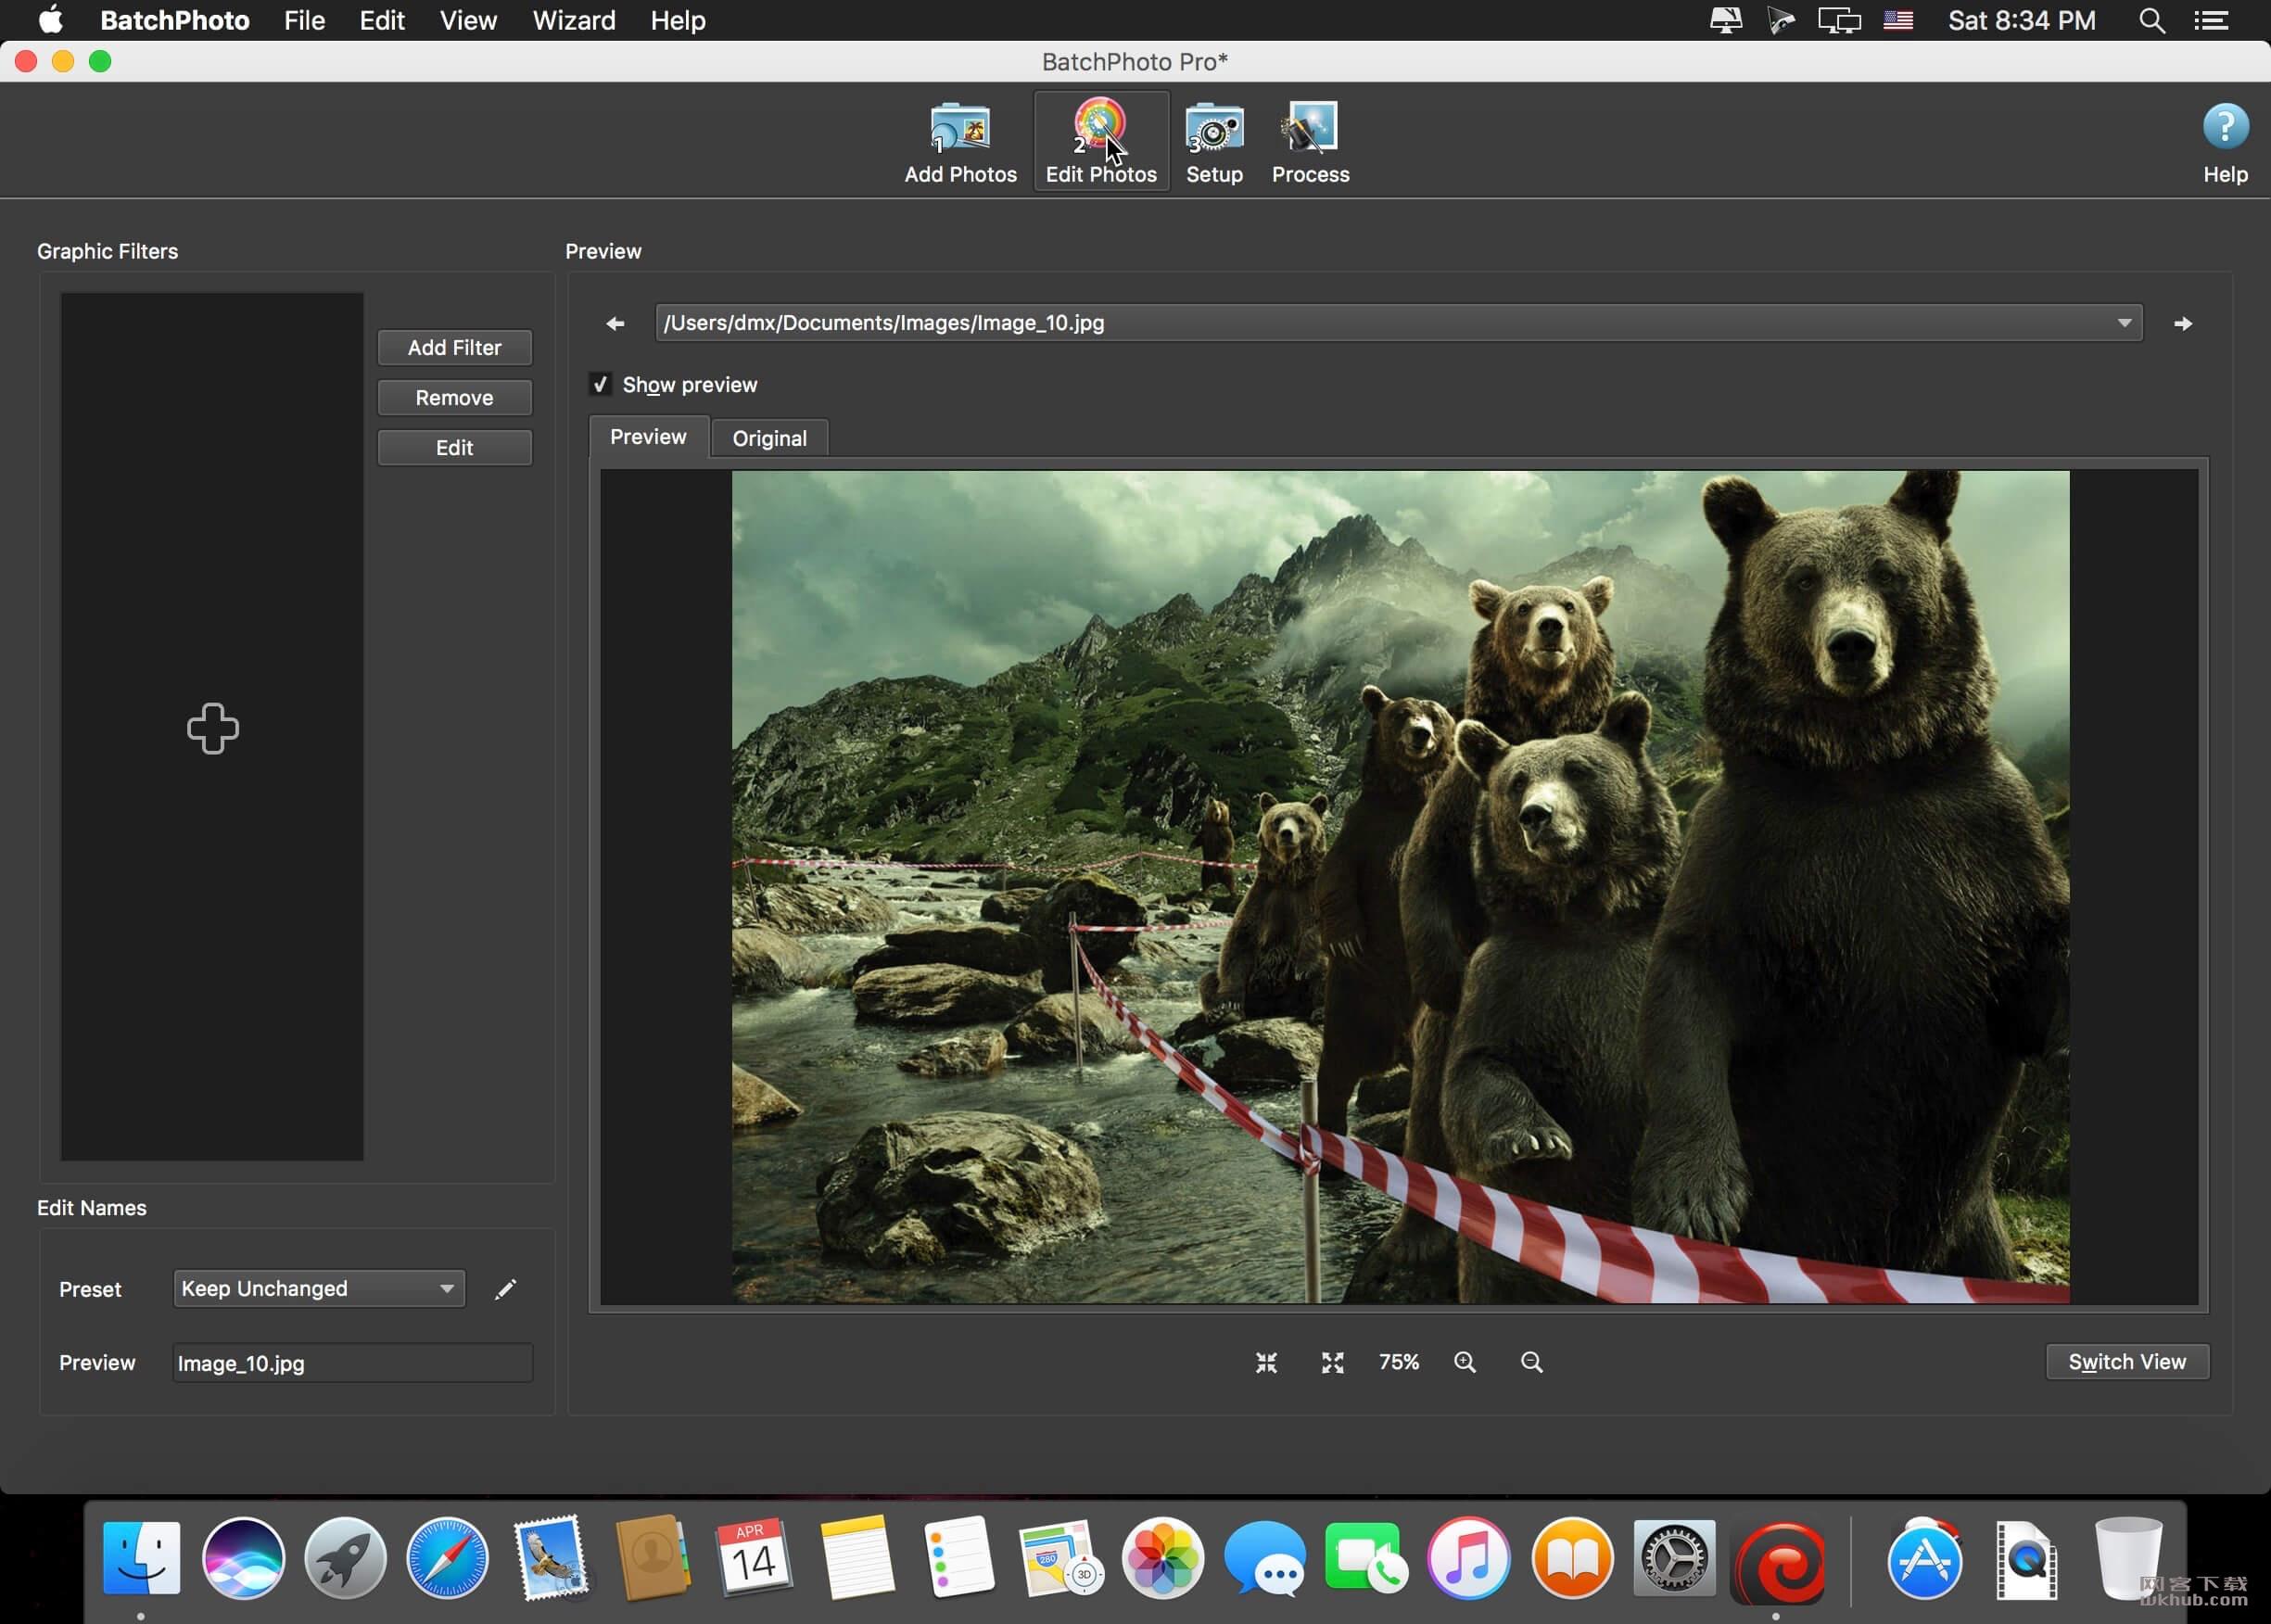 BatchPhoto Pro 4.4 照片批量处理工具